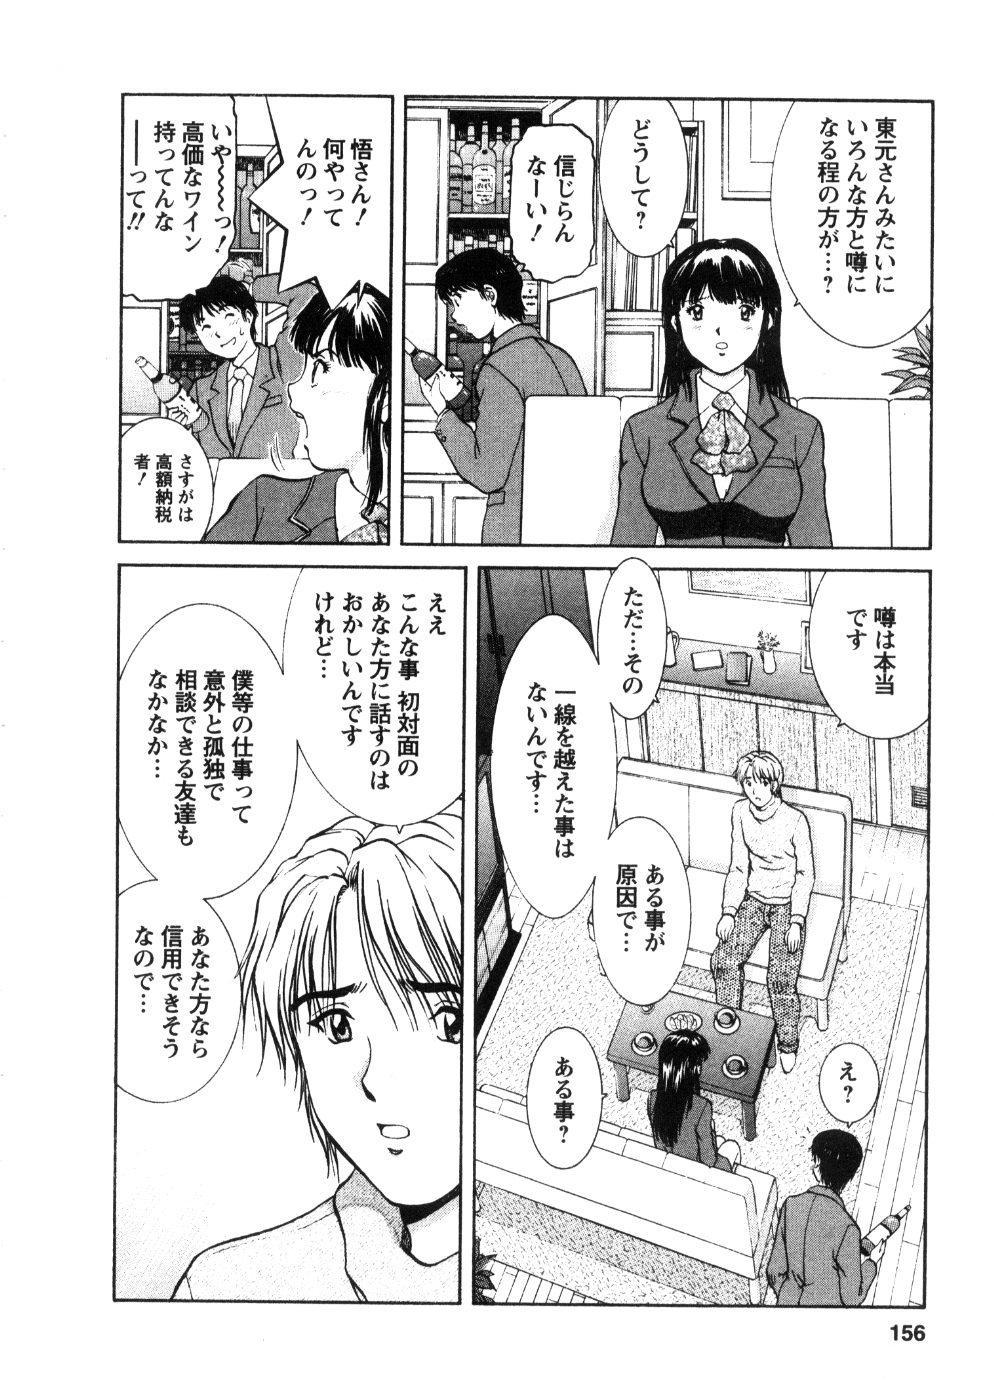 Oneechan-tachi ga Yatte Kuru 03 157